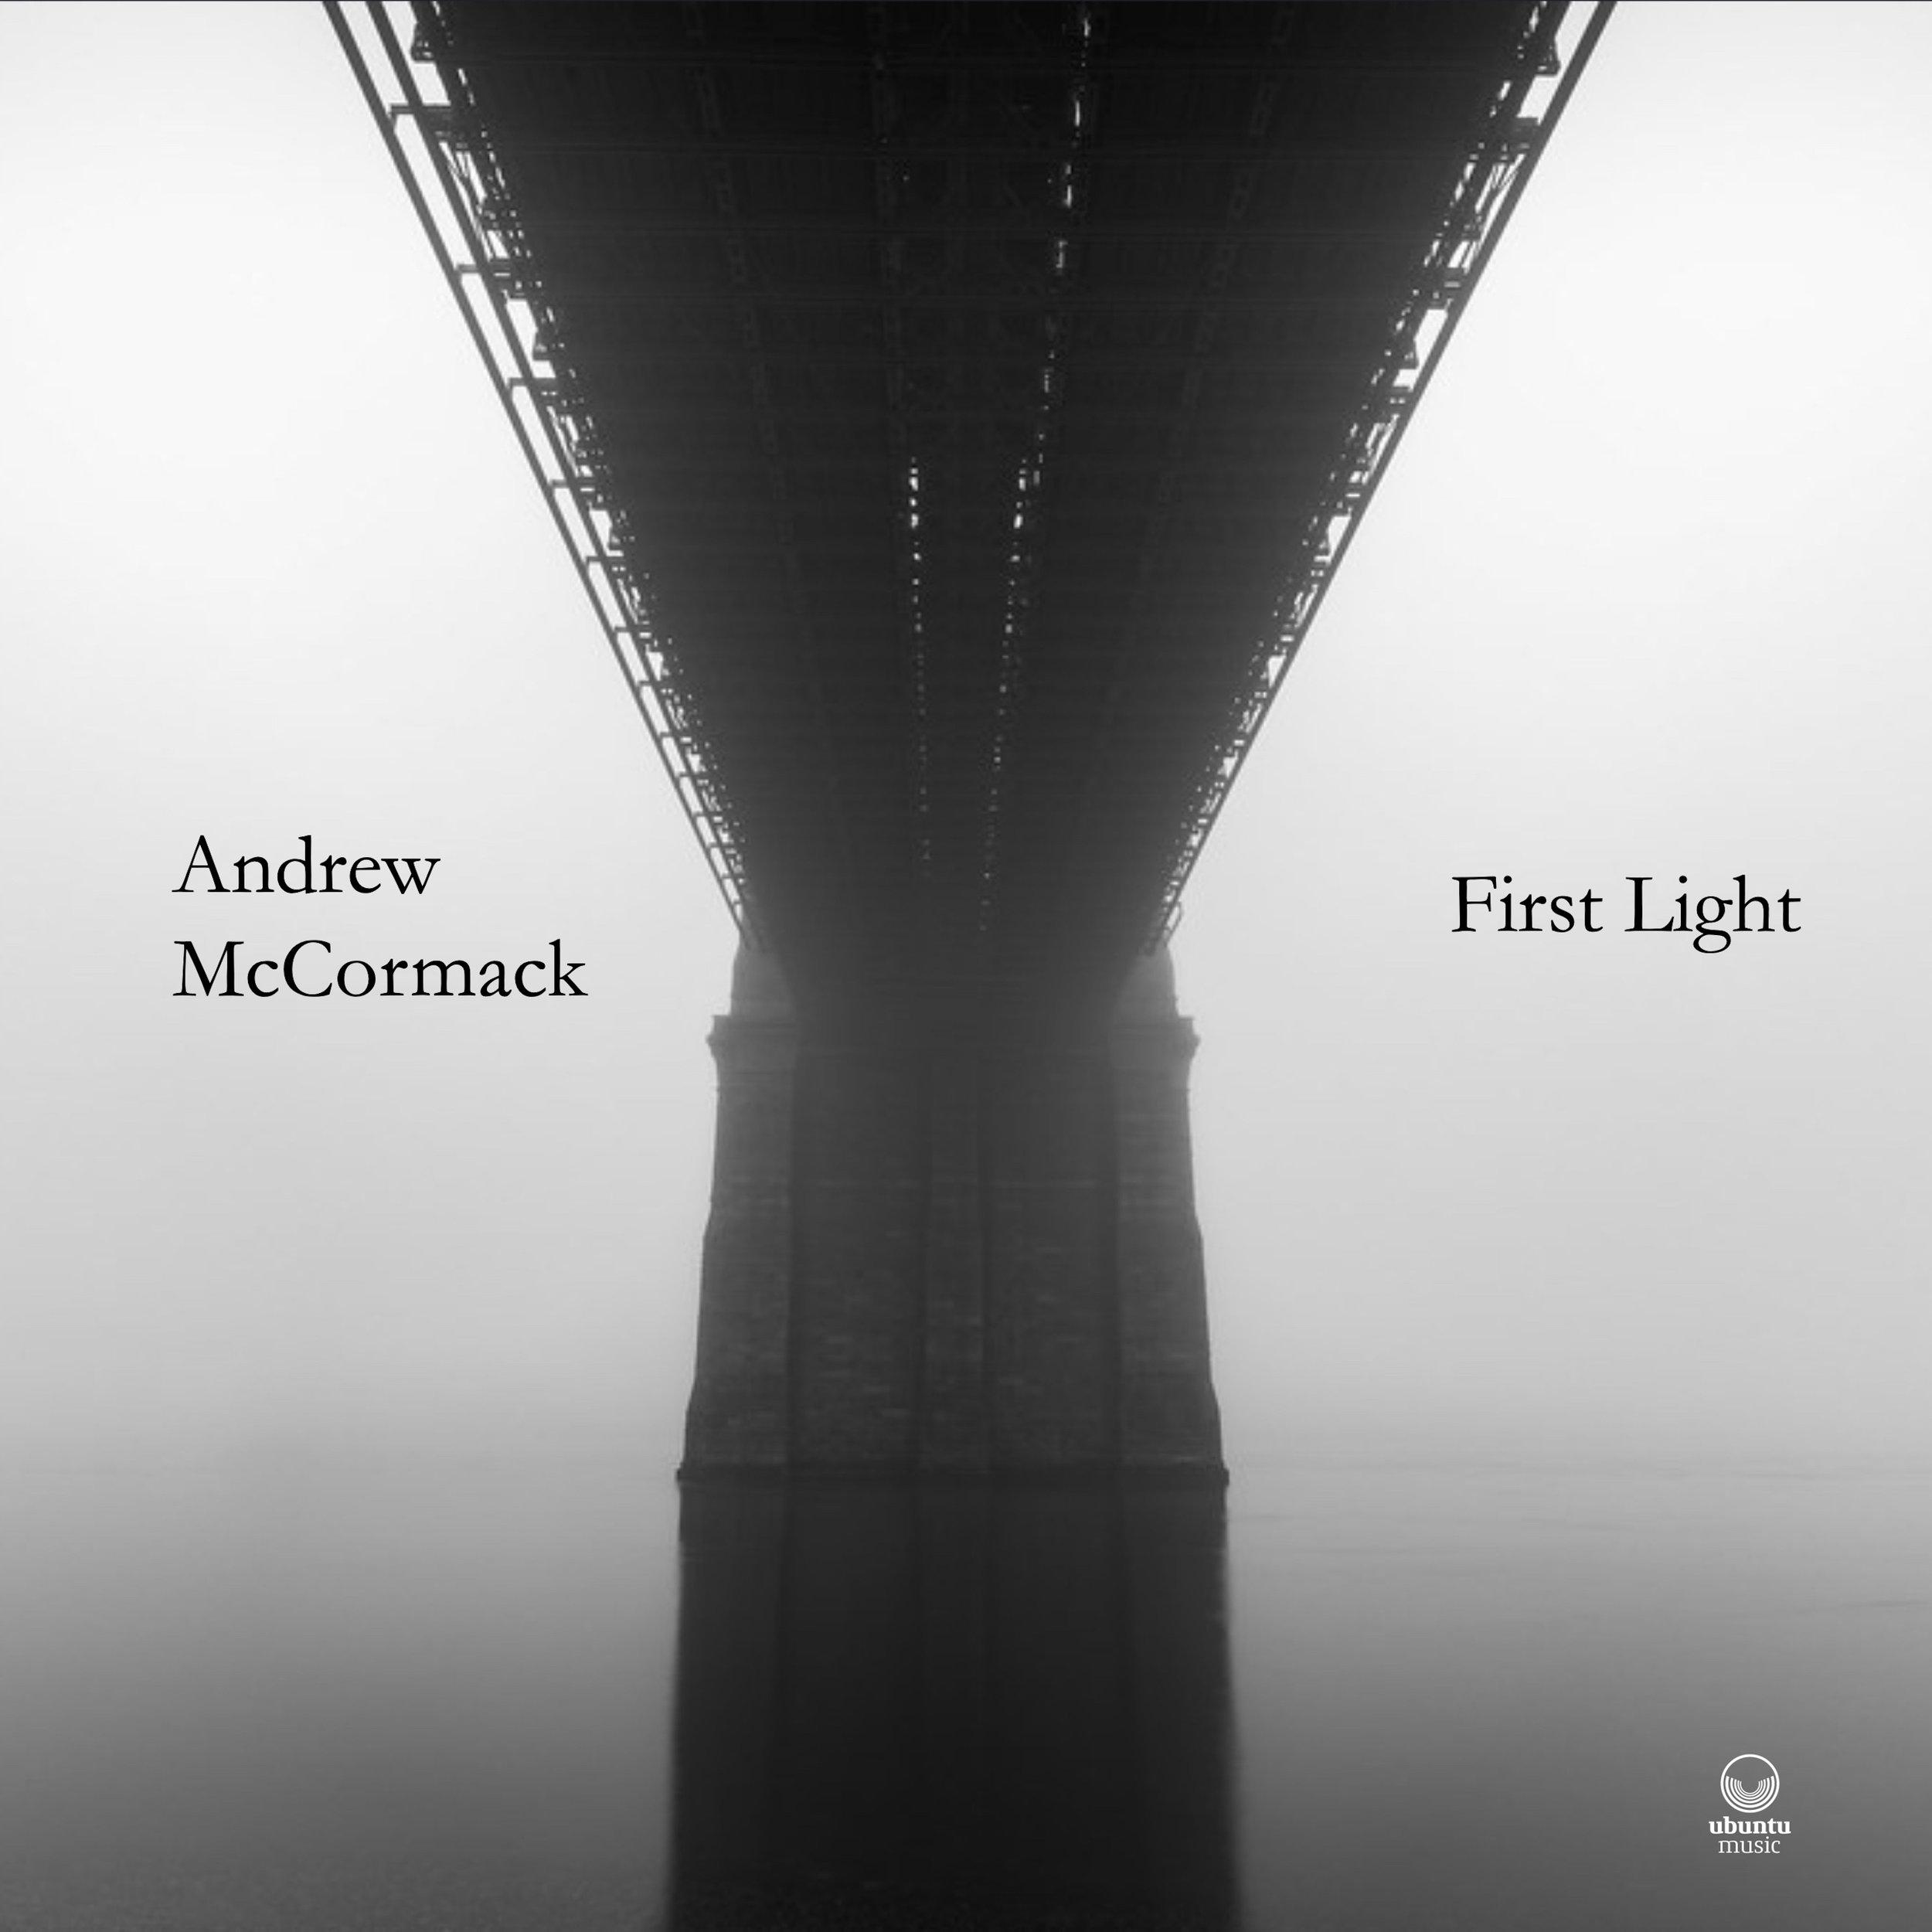 UBU0037_Andrew McCormack_First Light Cover FINAL_1.8.2019.jpg